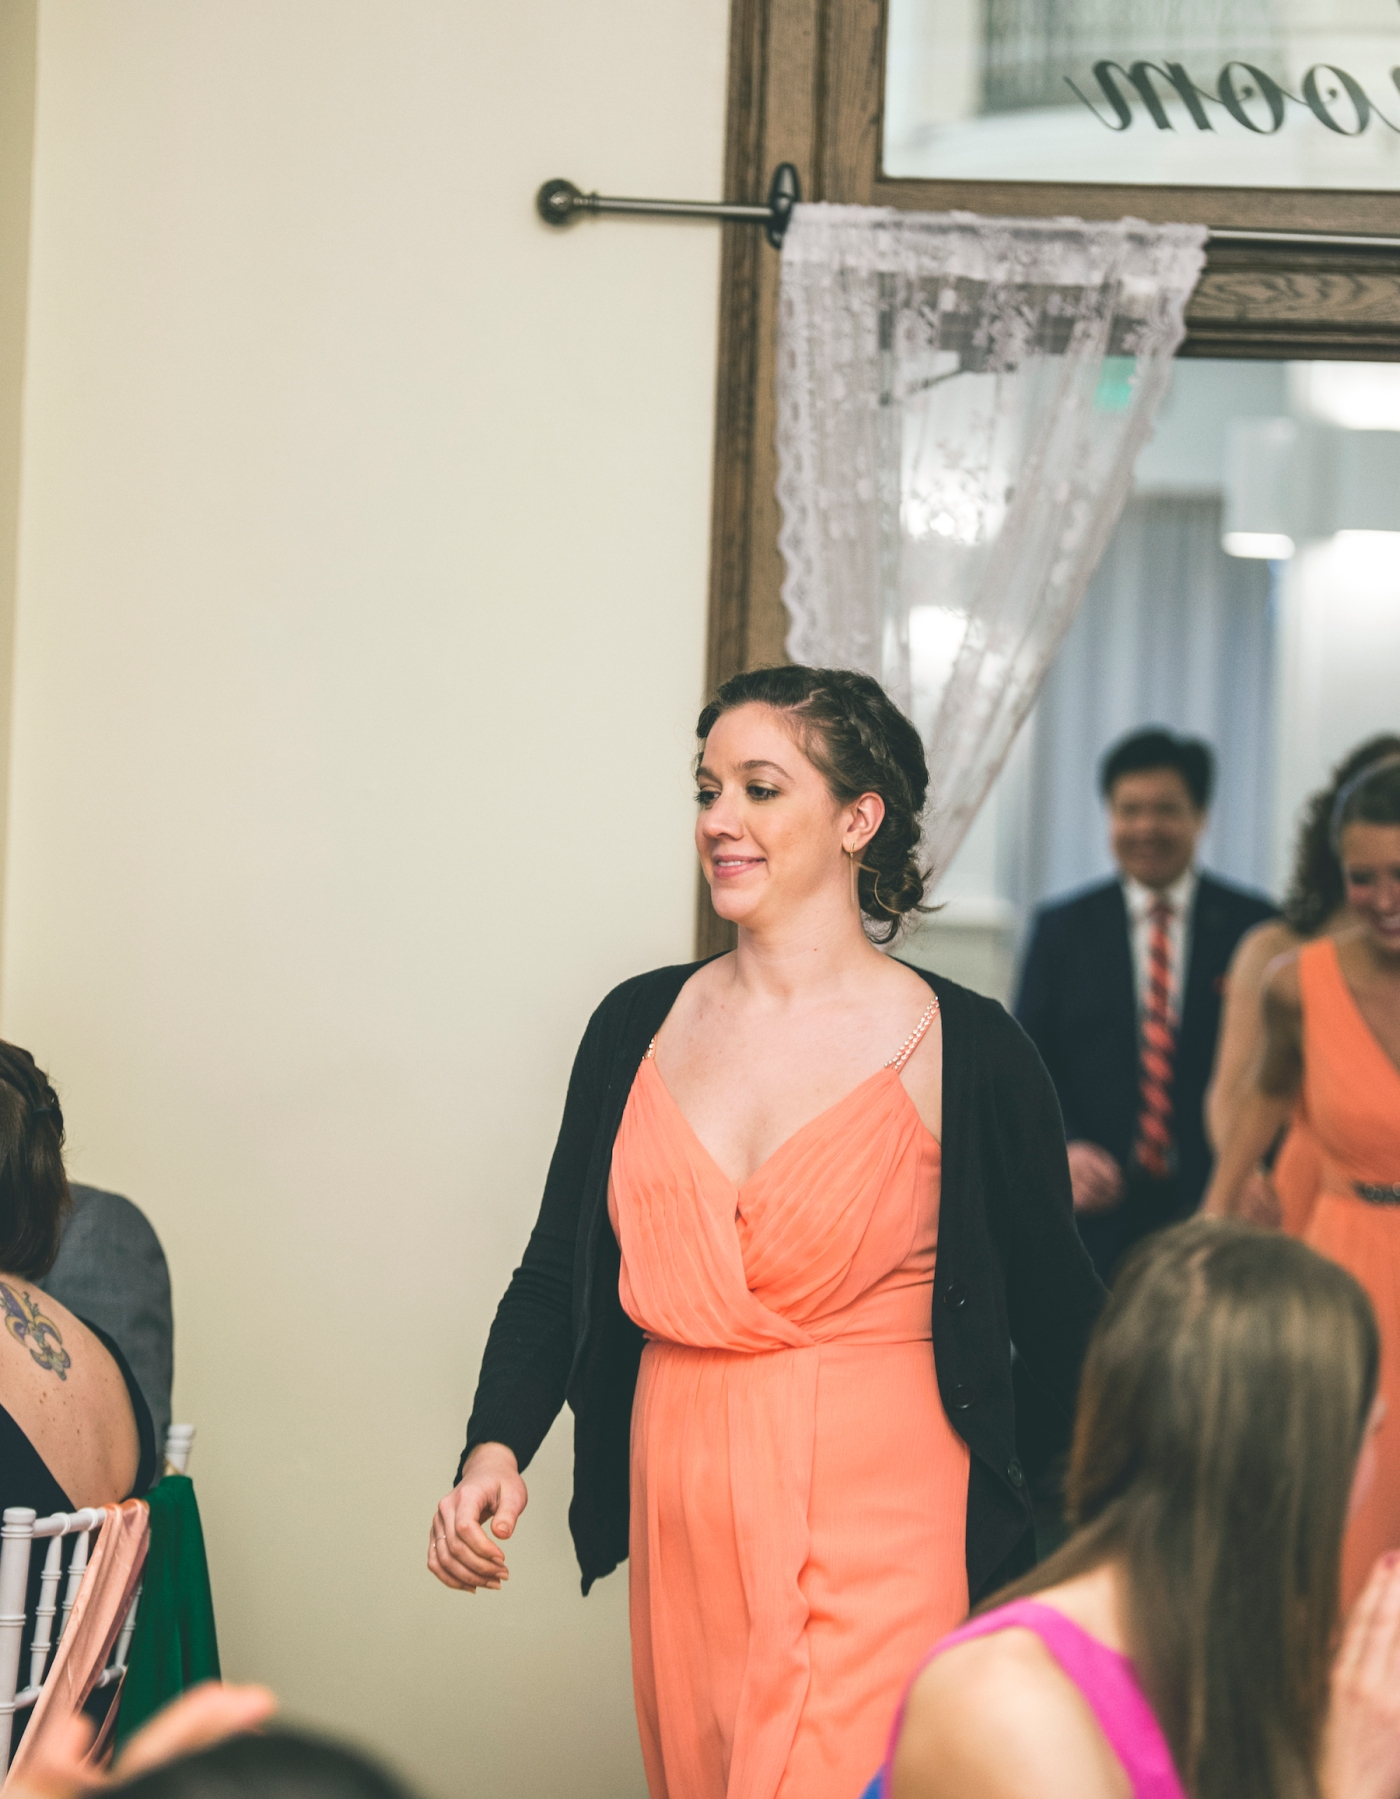 DSC_3139Everett_Wedding_Ballroom_Jane_Speleers_photography_Rachel_and_Edmund_reception_2017